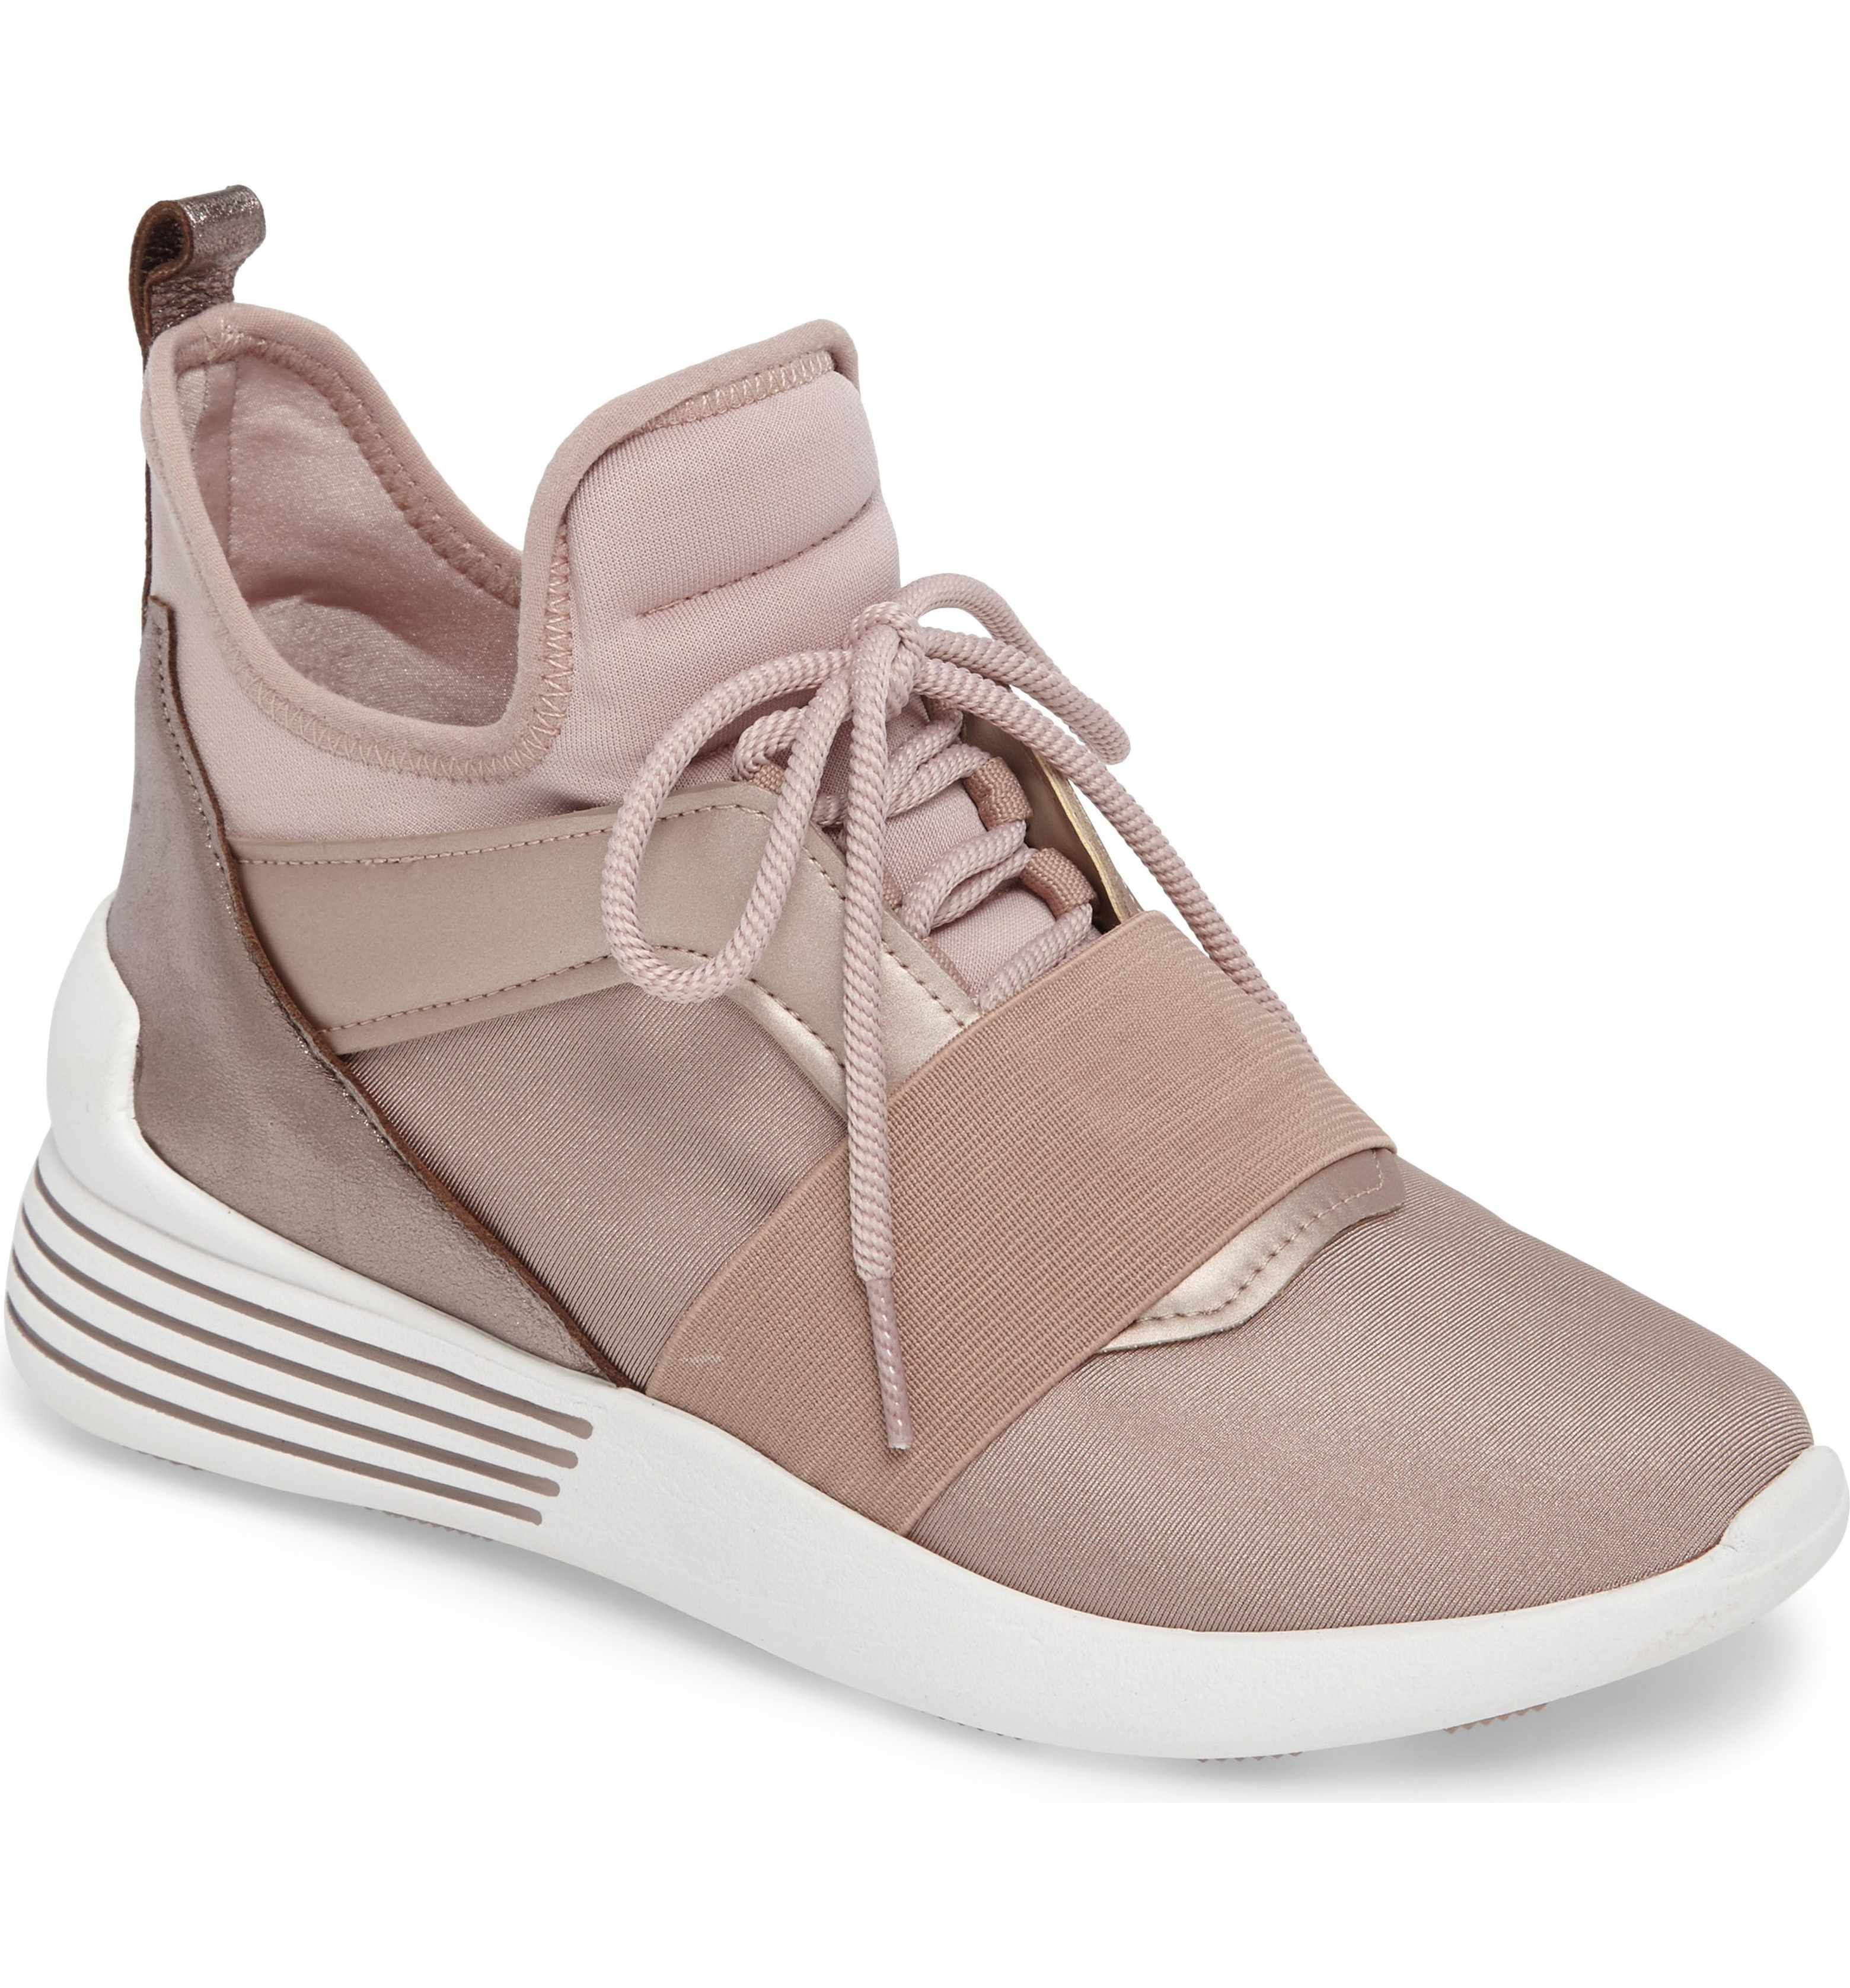 83a77810fe9 Main Image - KENDALL + KYLIE Braydin Sneaker (Women)